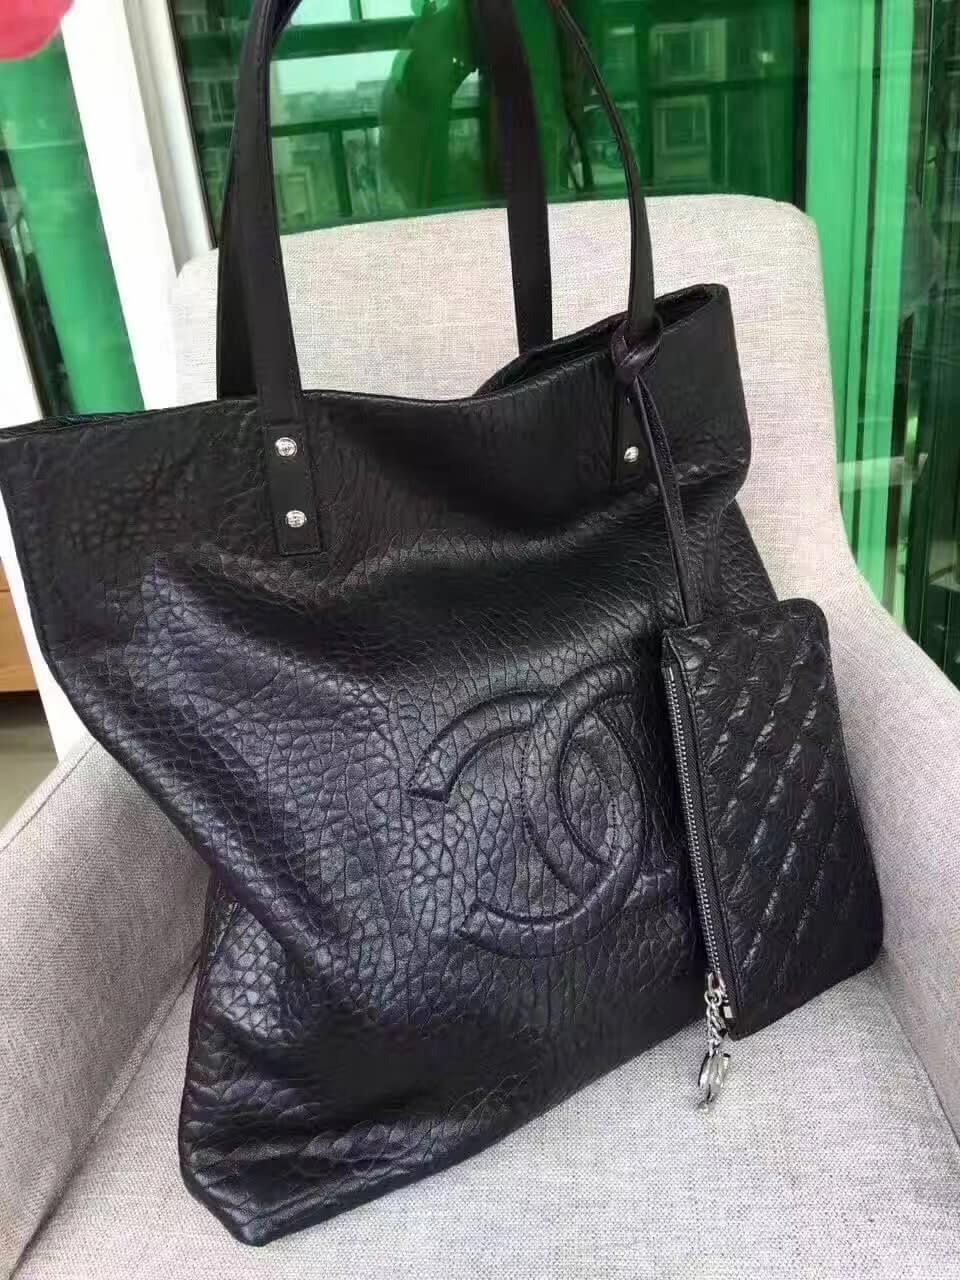 b1d4c8ea72c3 Chanel Calfskin Shopping Tote Black #WomensShoulderbags   Bags in ...